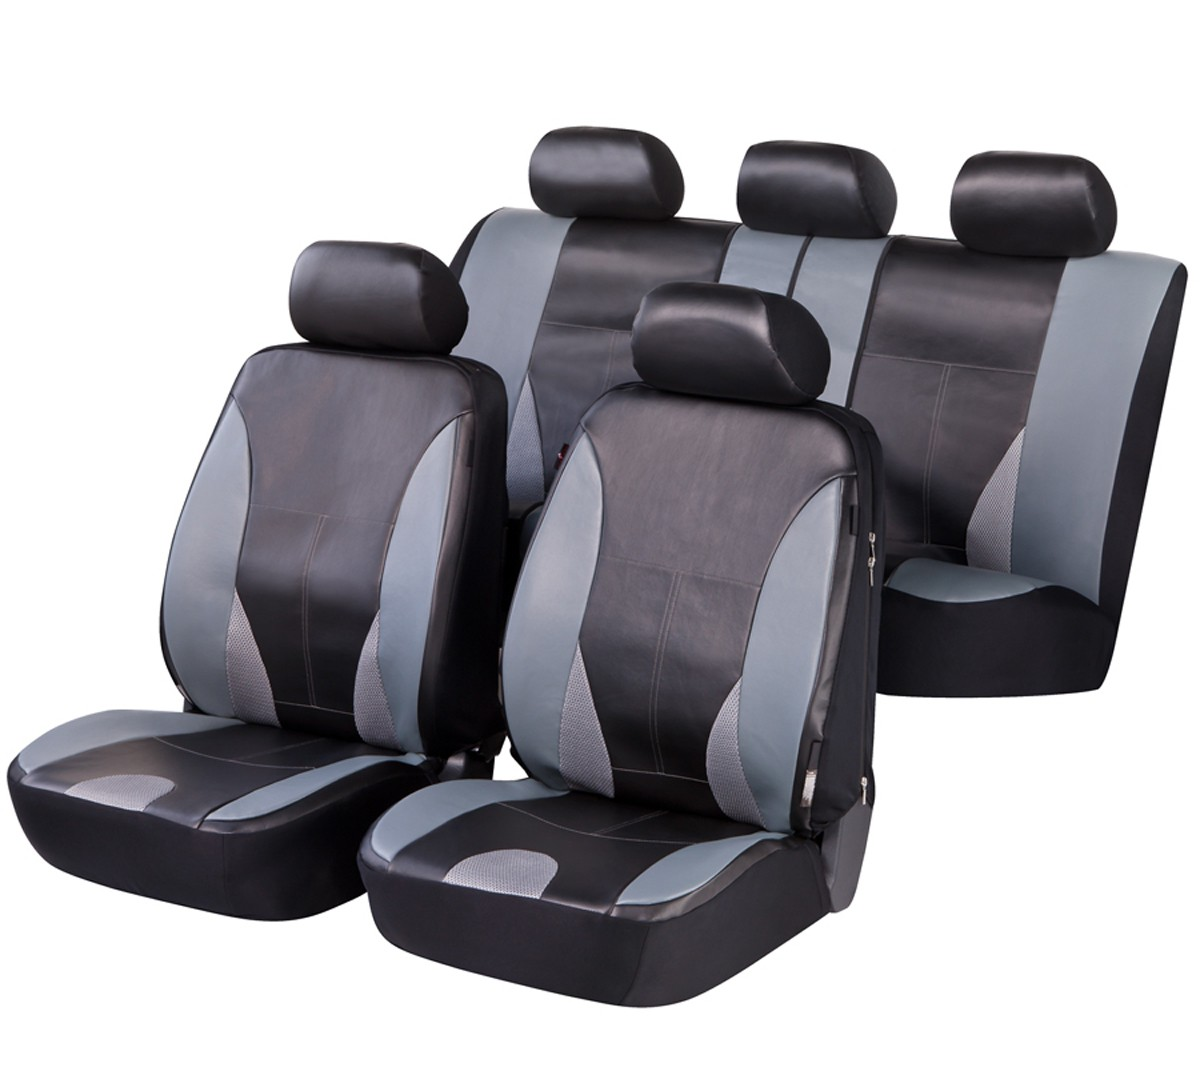 Schwarz-graue Sitzbezüge für MITSUBISHI CARISMA Autositzbezug Komplett